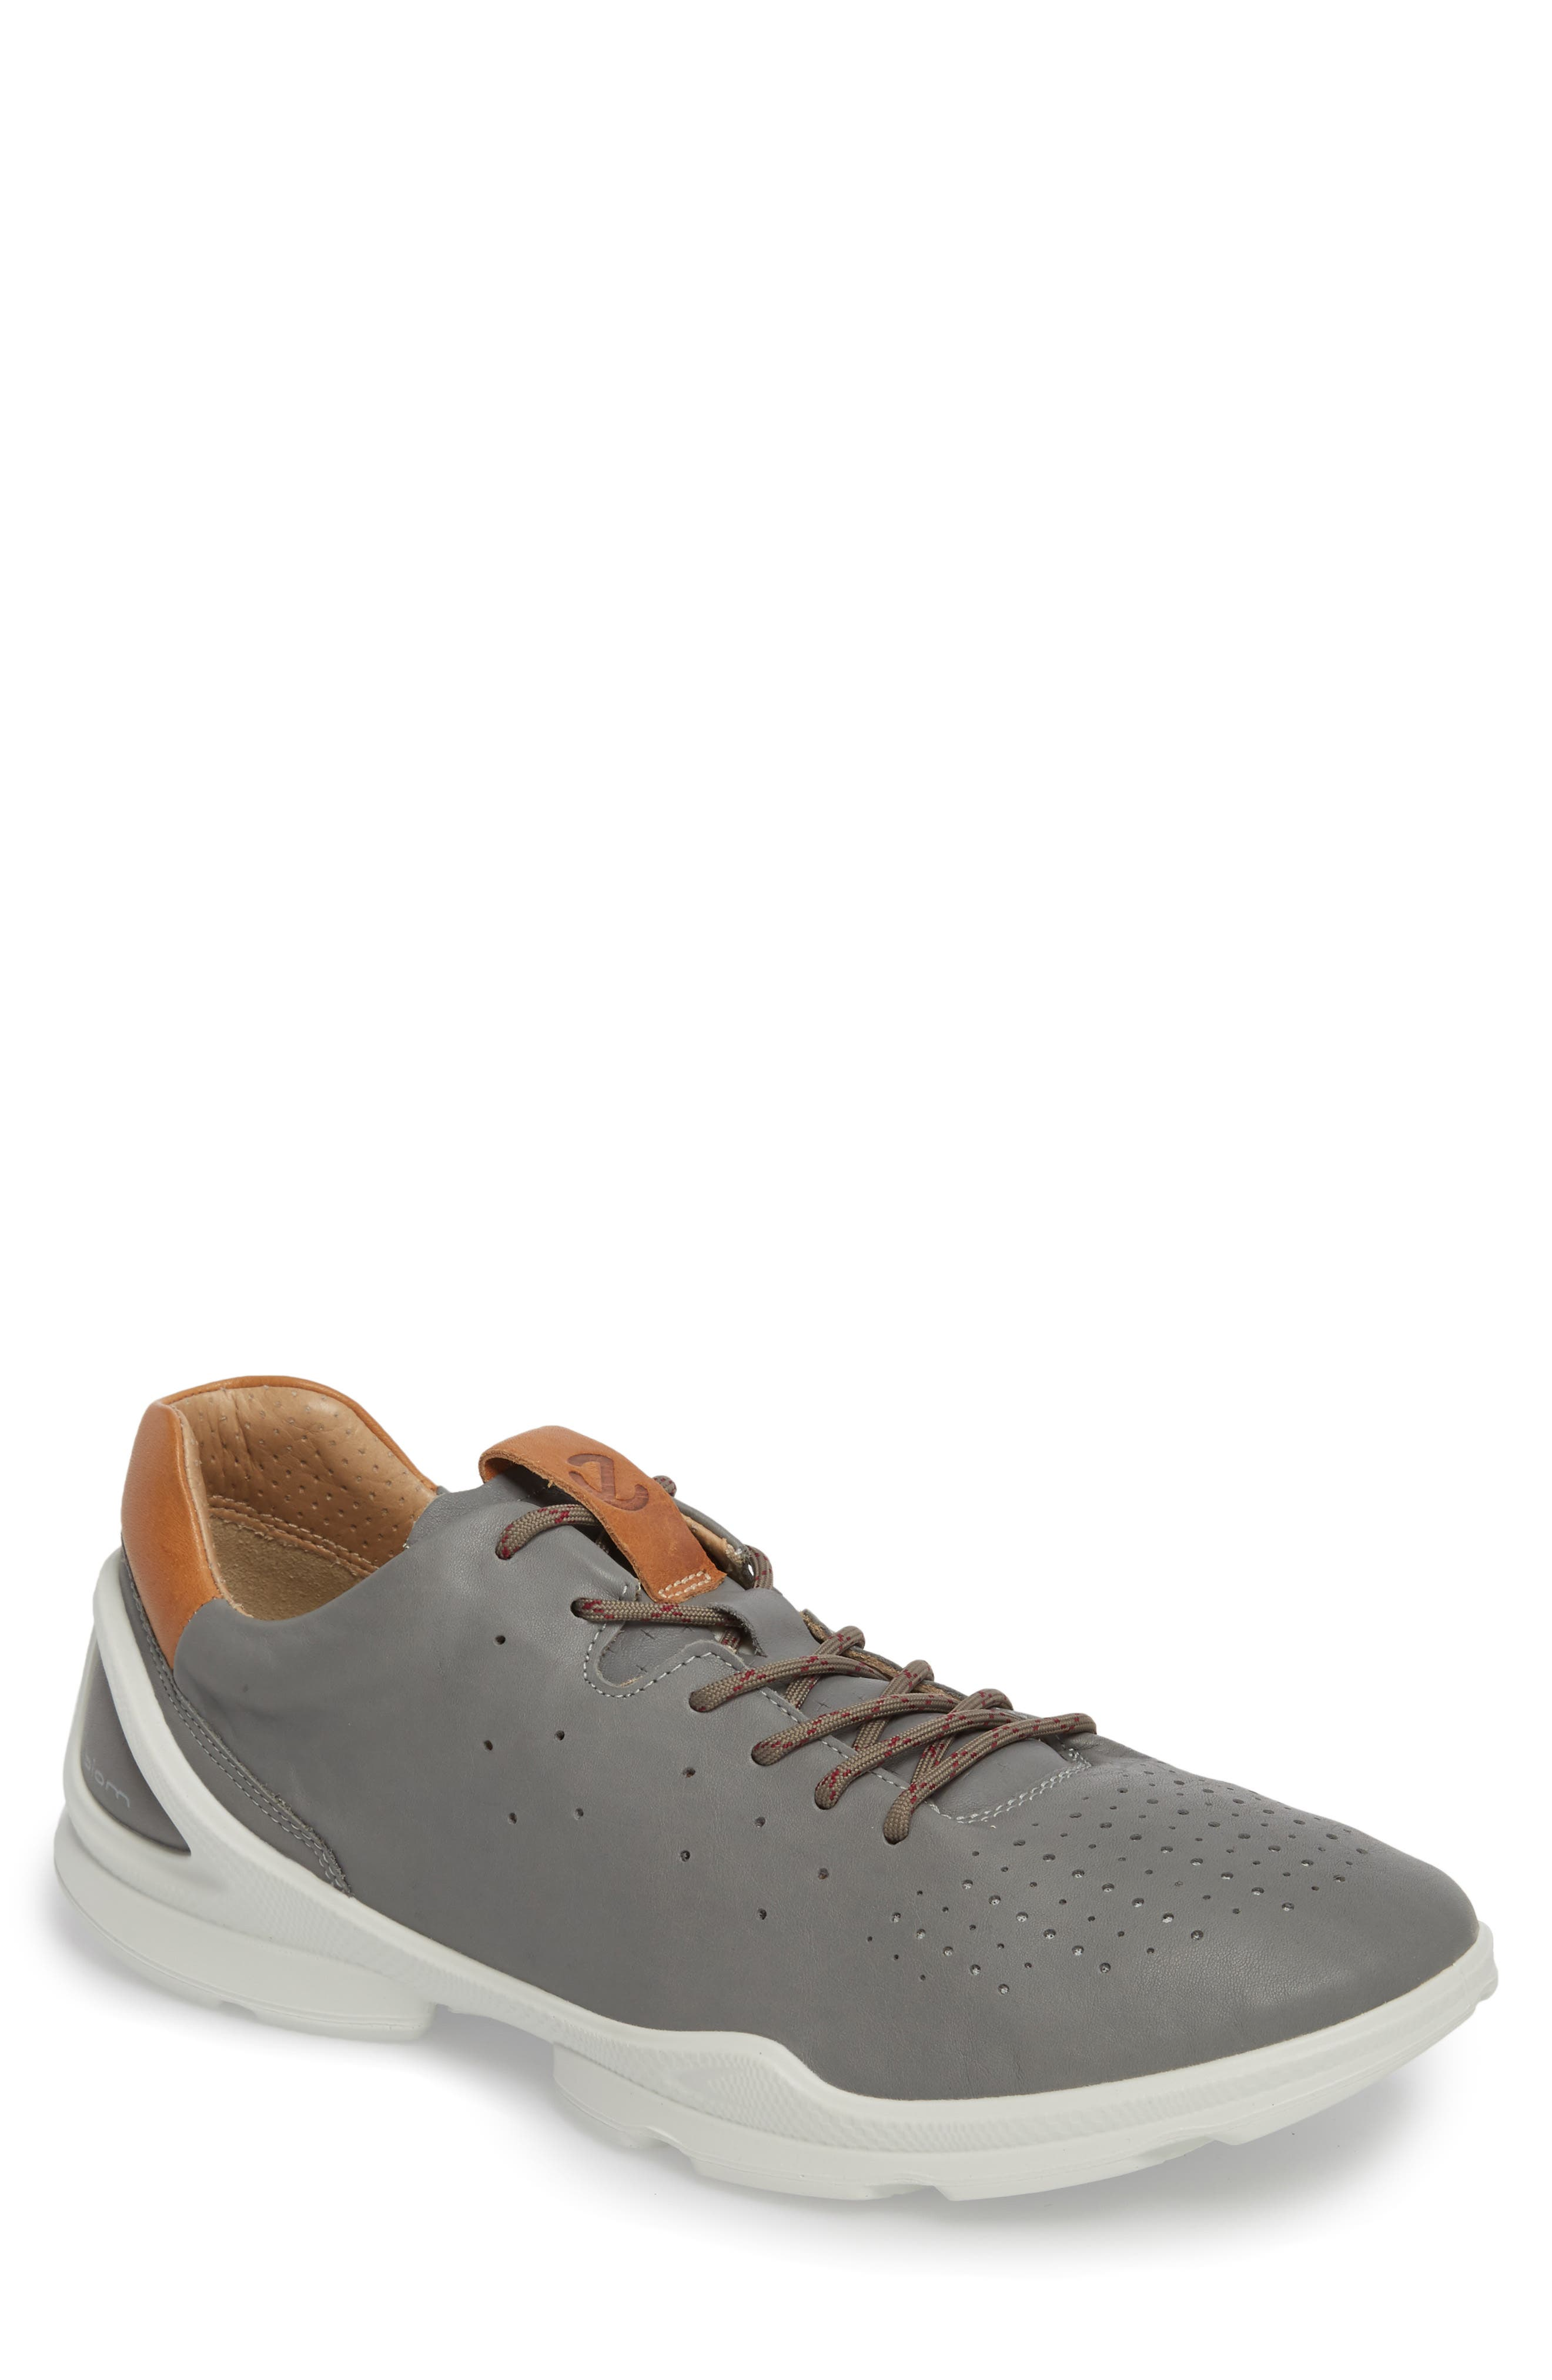 Biom Street Sneaker,                         Main,                         color, Wild Dove Leather